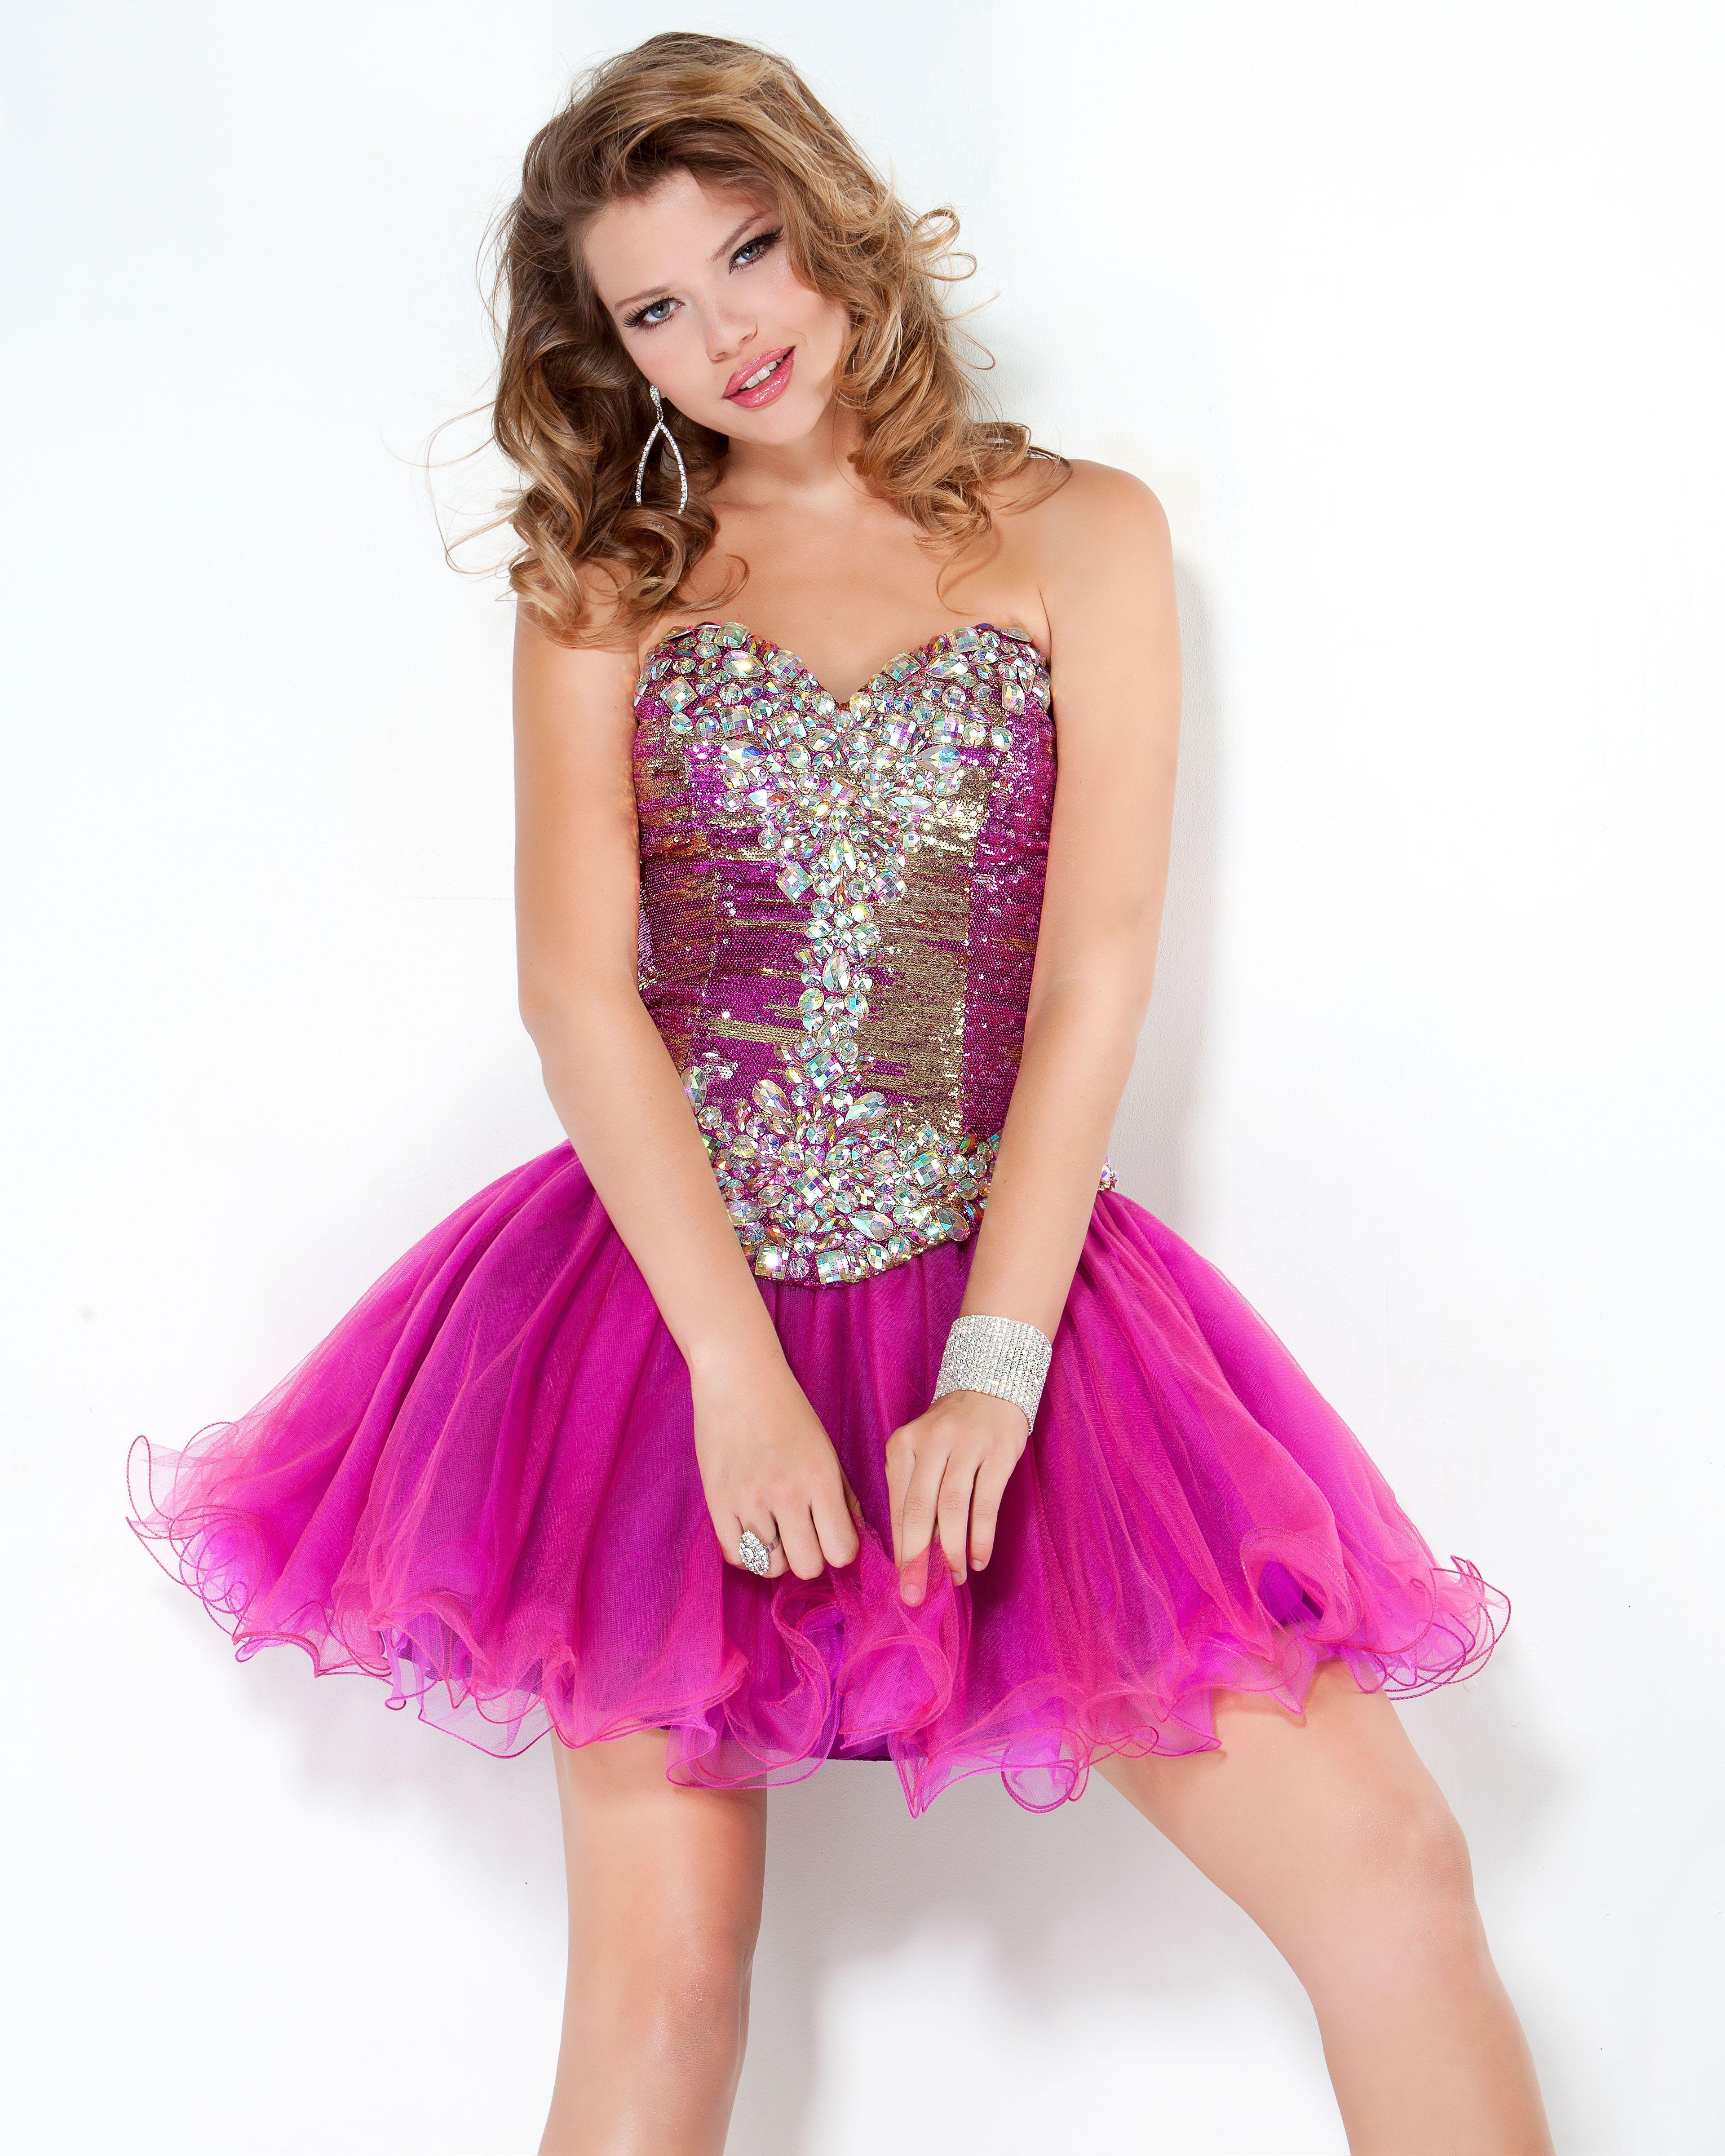 Vestido de Balada | Vestido de Balada | Pinterest